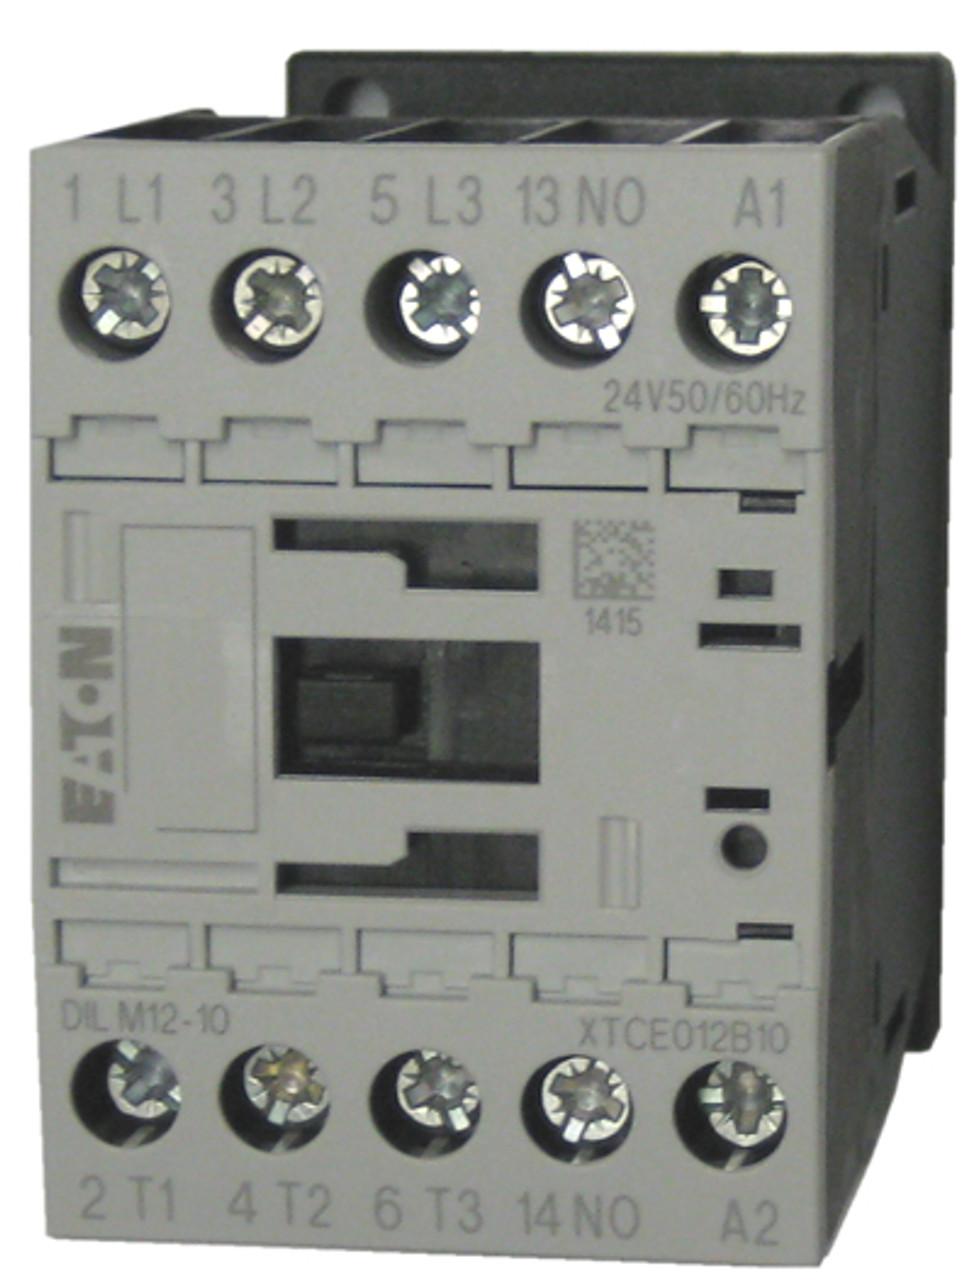 BIT SP-10 10 Zweilochschrauben Linsenkopf 4,8X50 Edelstahl A2 Blechschrauben m